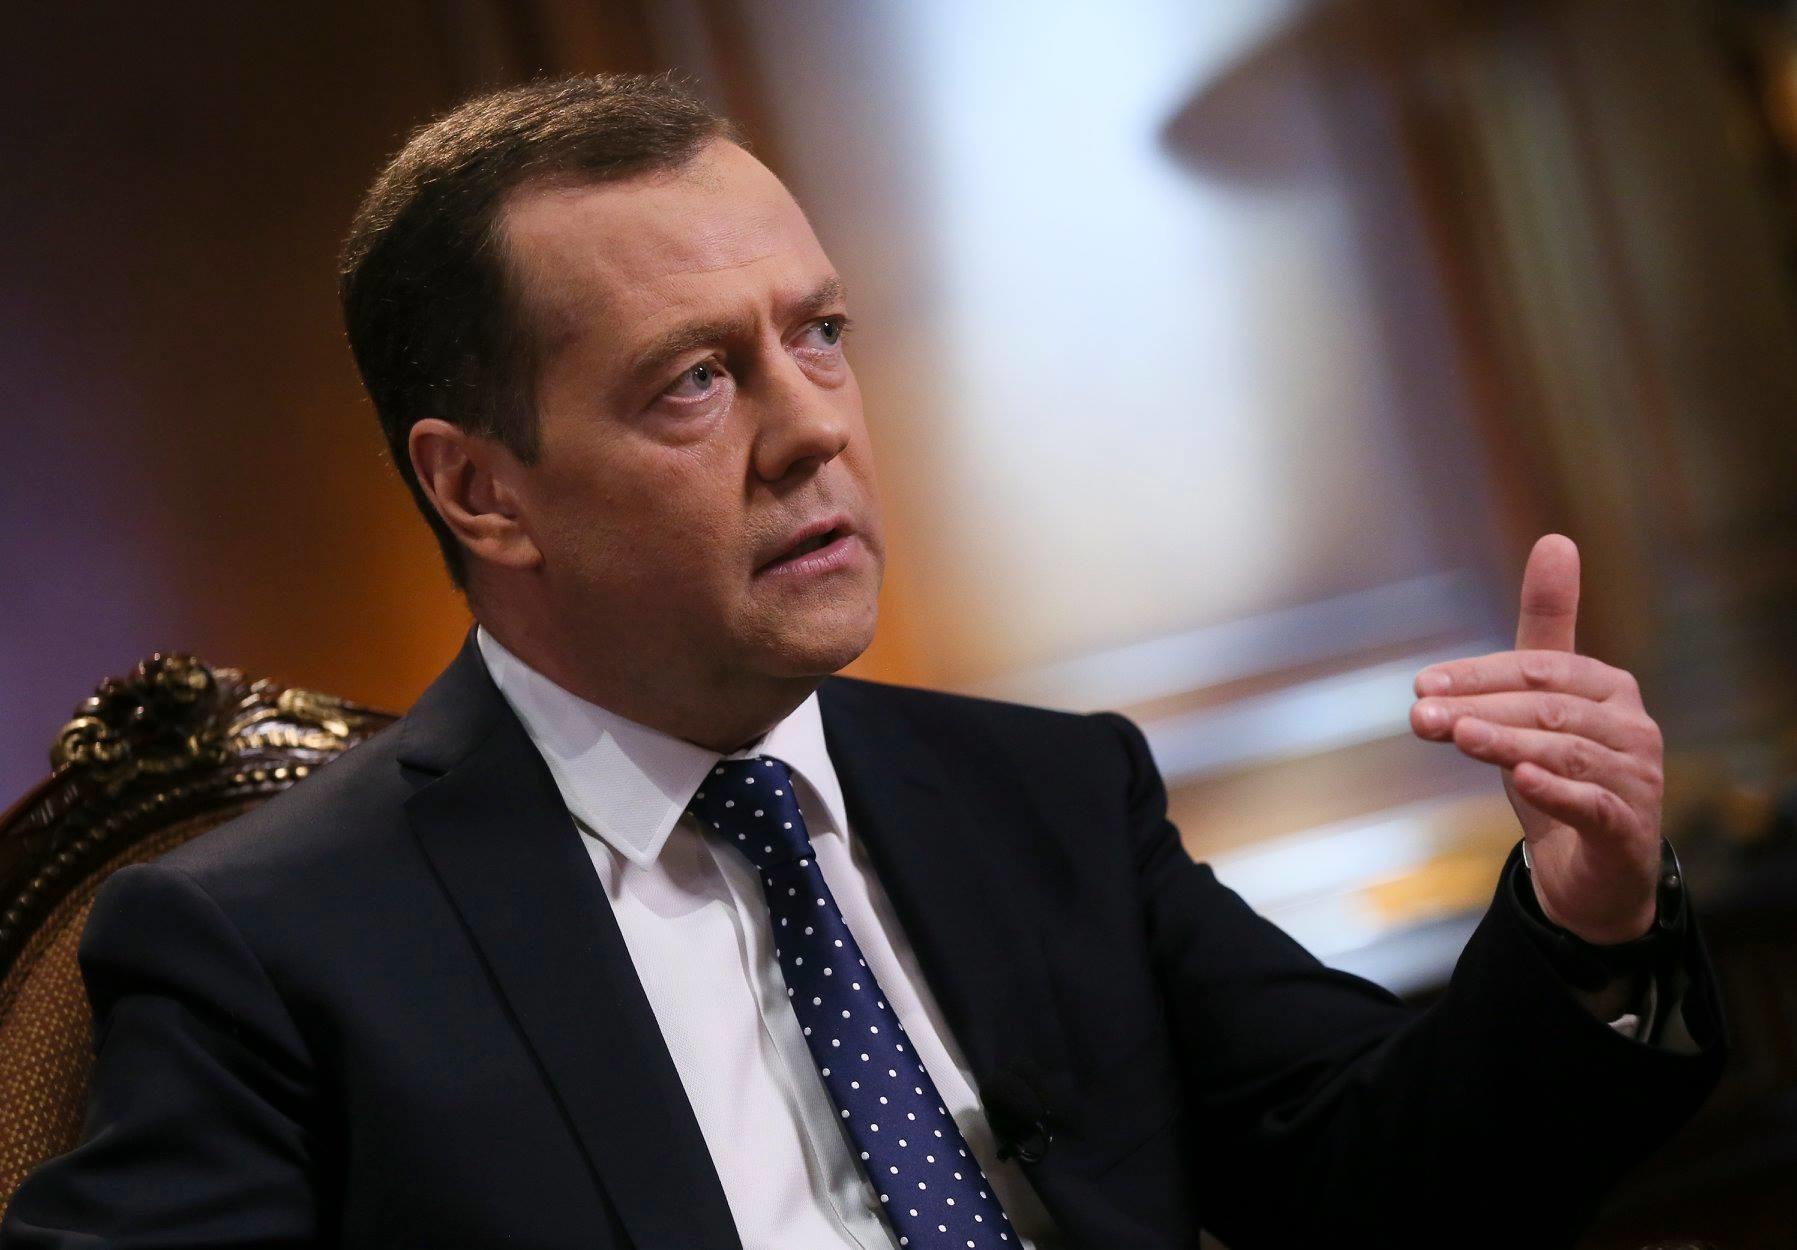 "<p>Фото: &copy; Facebook/<a href=""https://www.facebook.com/Dmitry.Medvedev/?tn-str=k%2AF"" data-ft=""{&quot;tn&quot;:&quot;k&quot;}"" data-hovercard=""/ajax/hovercard/page.php?id=175517041850&amp;extragetparams=%7B%22tn-str%22%3A%22k%2AF%22%7D"" data-hovercard-prefer-more-content-show=""1"">Дмитрий Медведев</a></p> <div> <div> <div></div> </div> </div>"